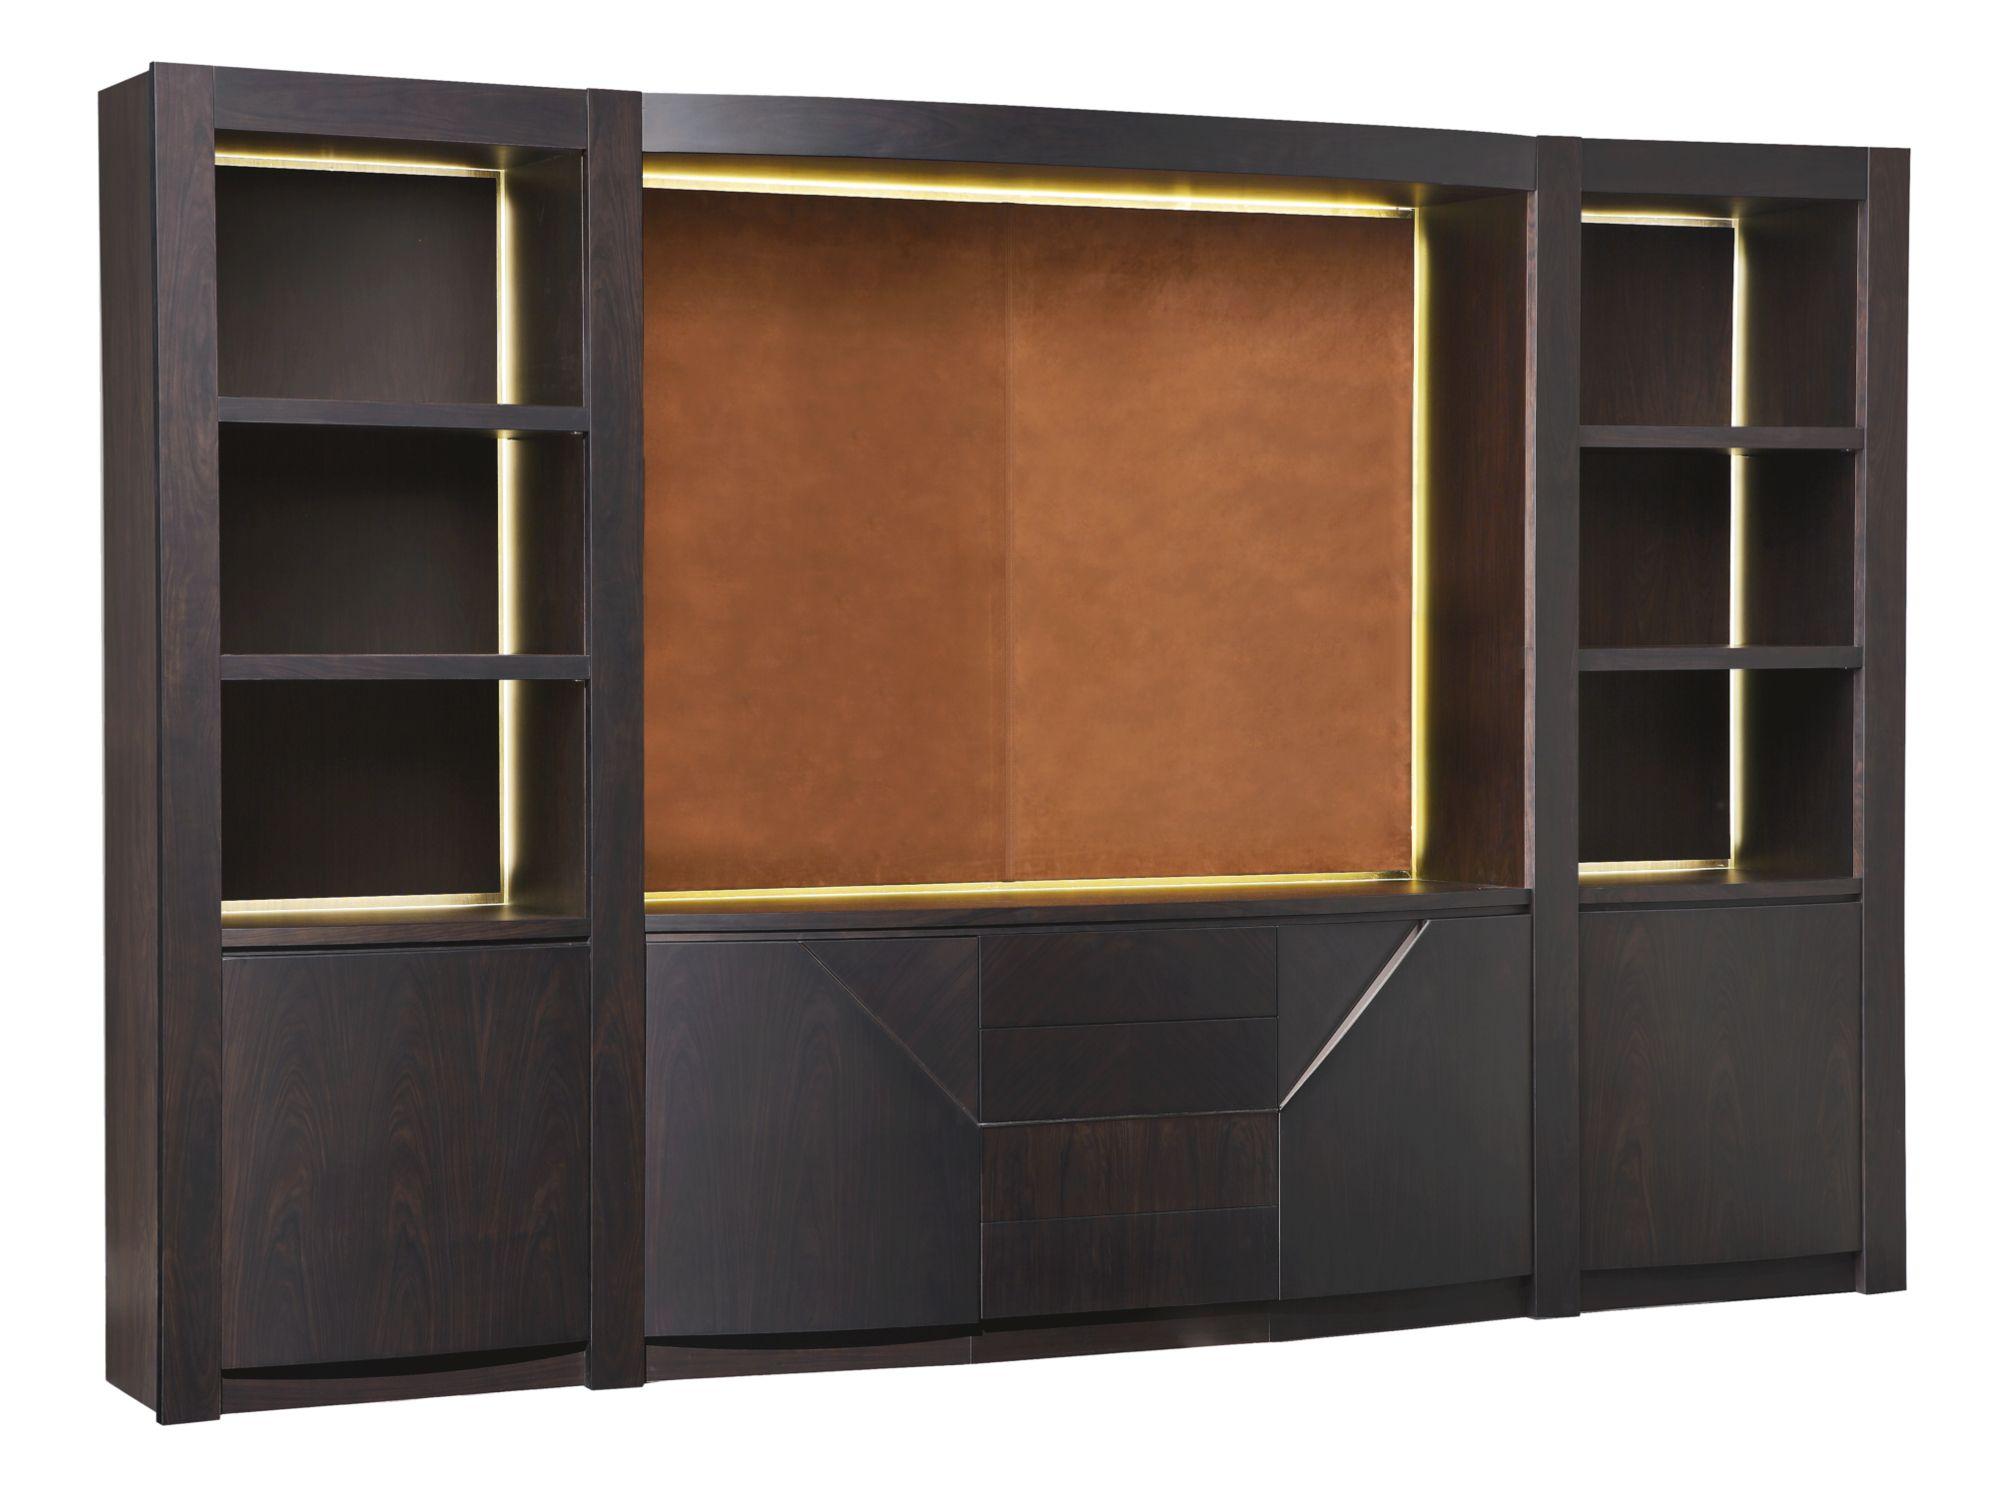 Книжный шкаф grant 4linee.ru.